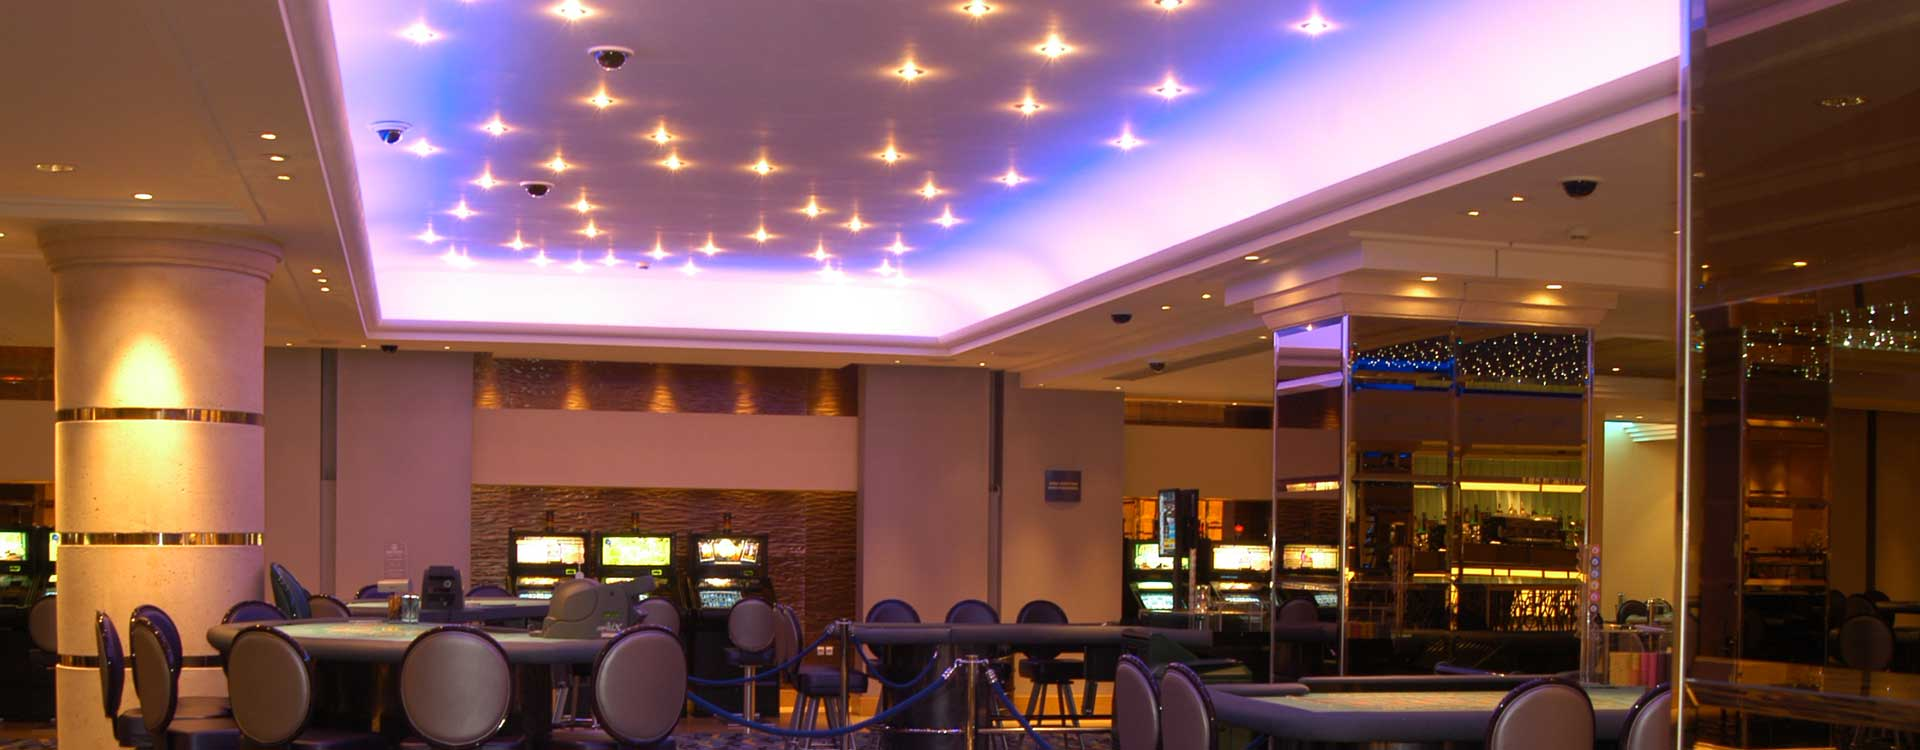 Ufo Star Effect Lighting In The Gran Casino Aljarafe